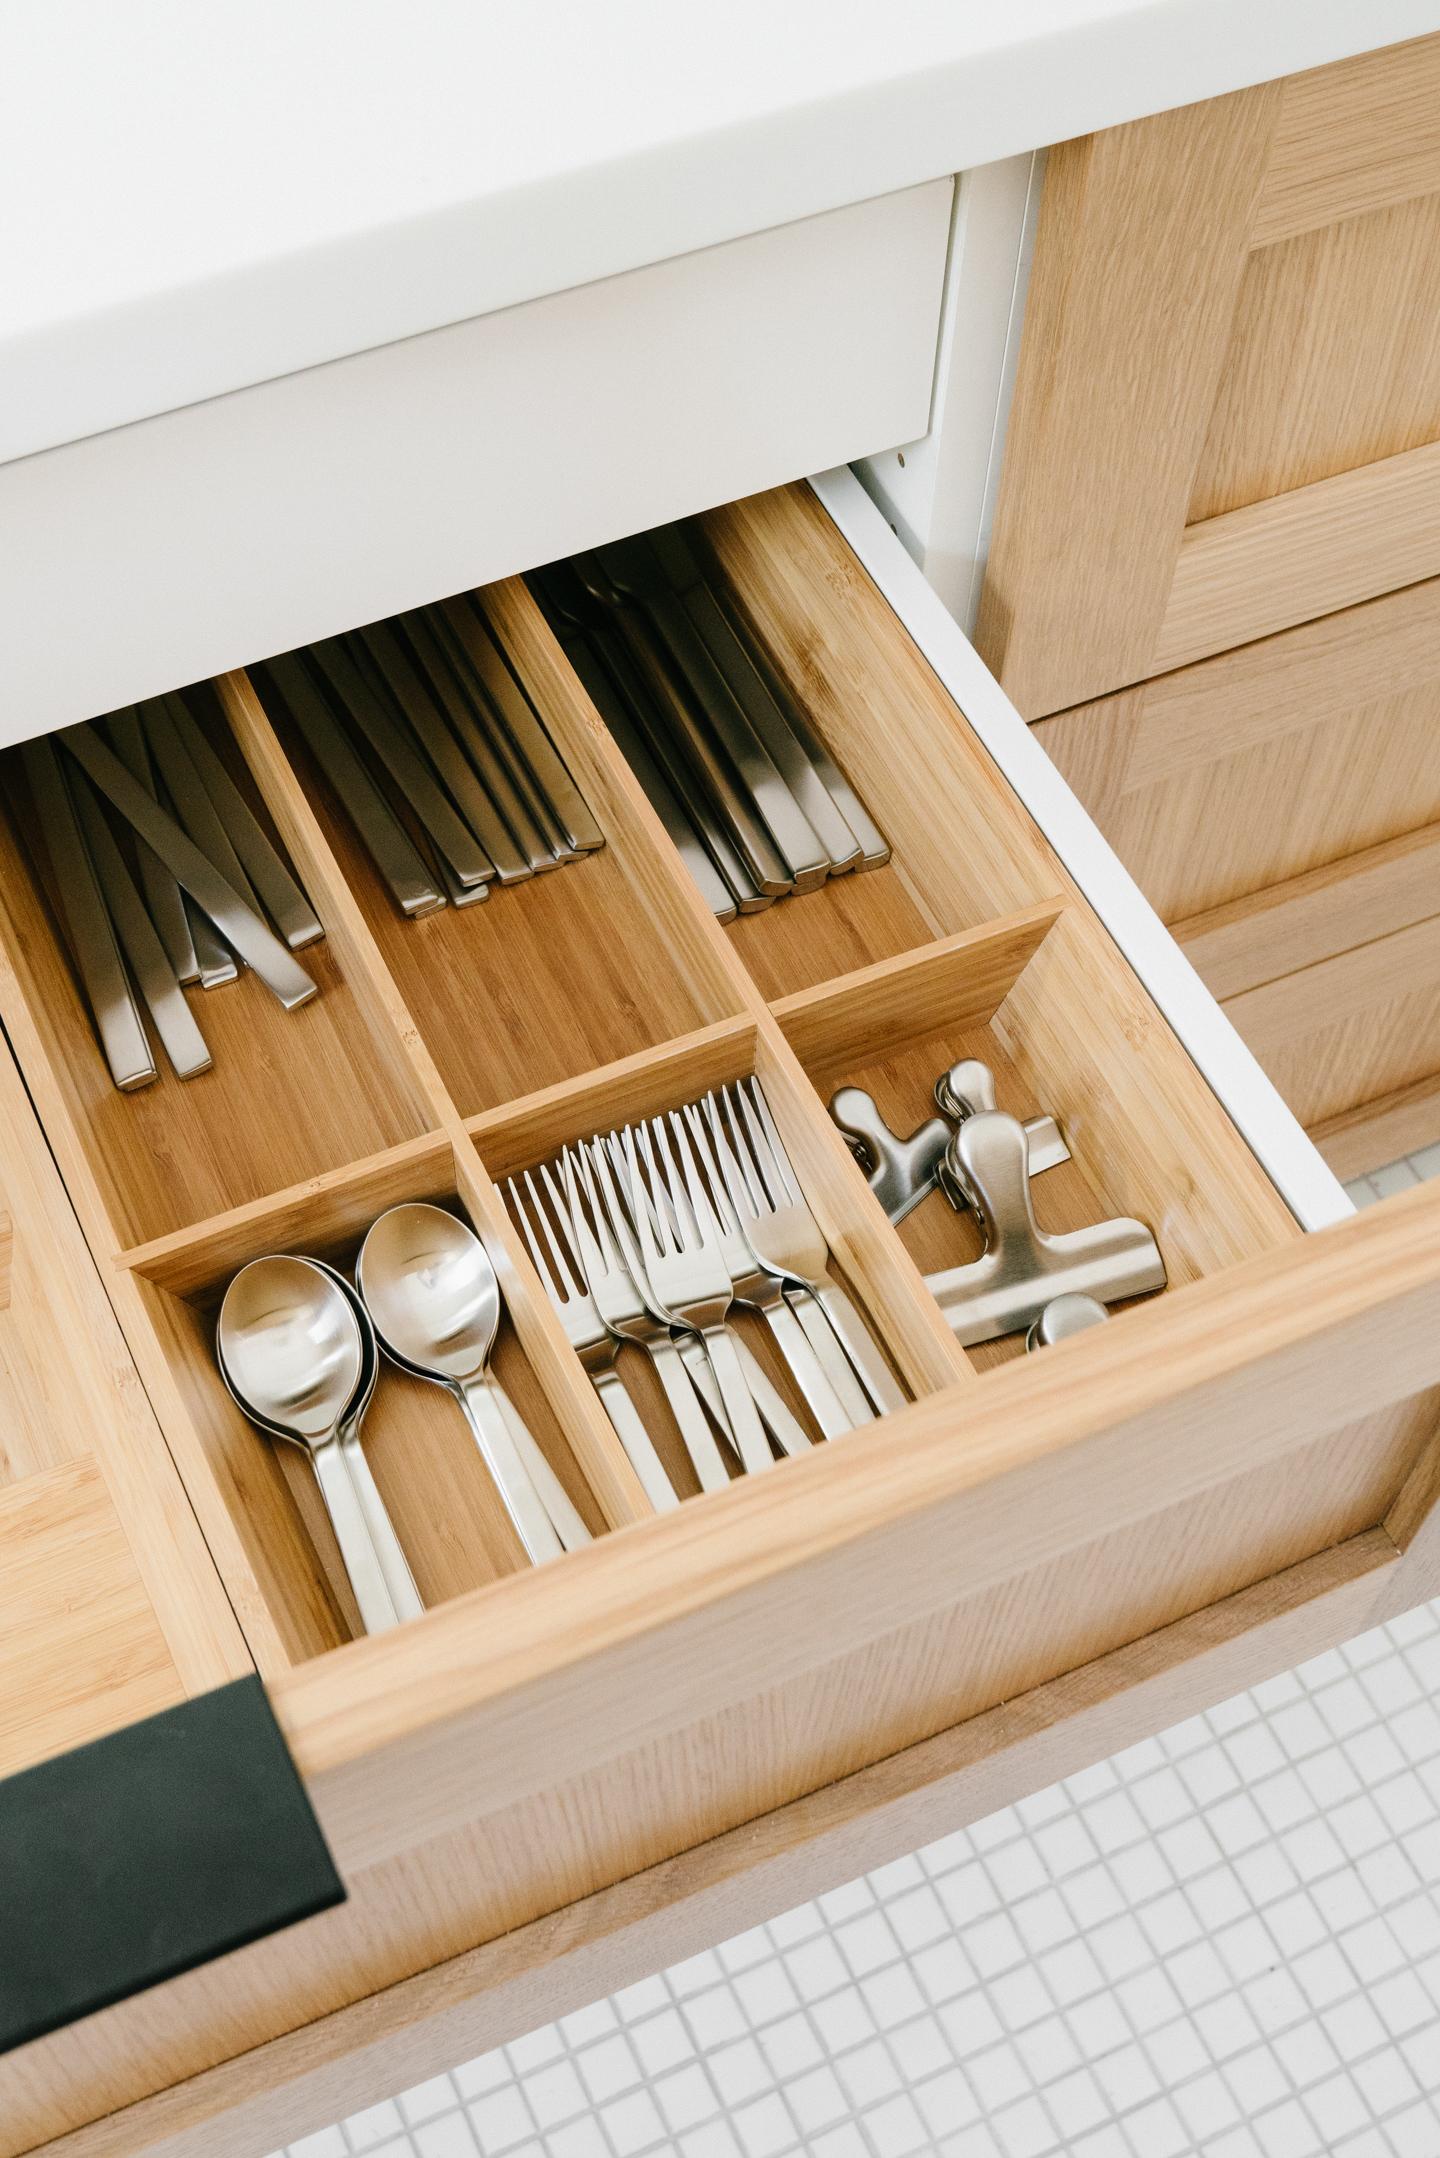 minimalist organized flatware drawer